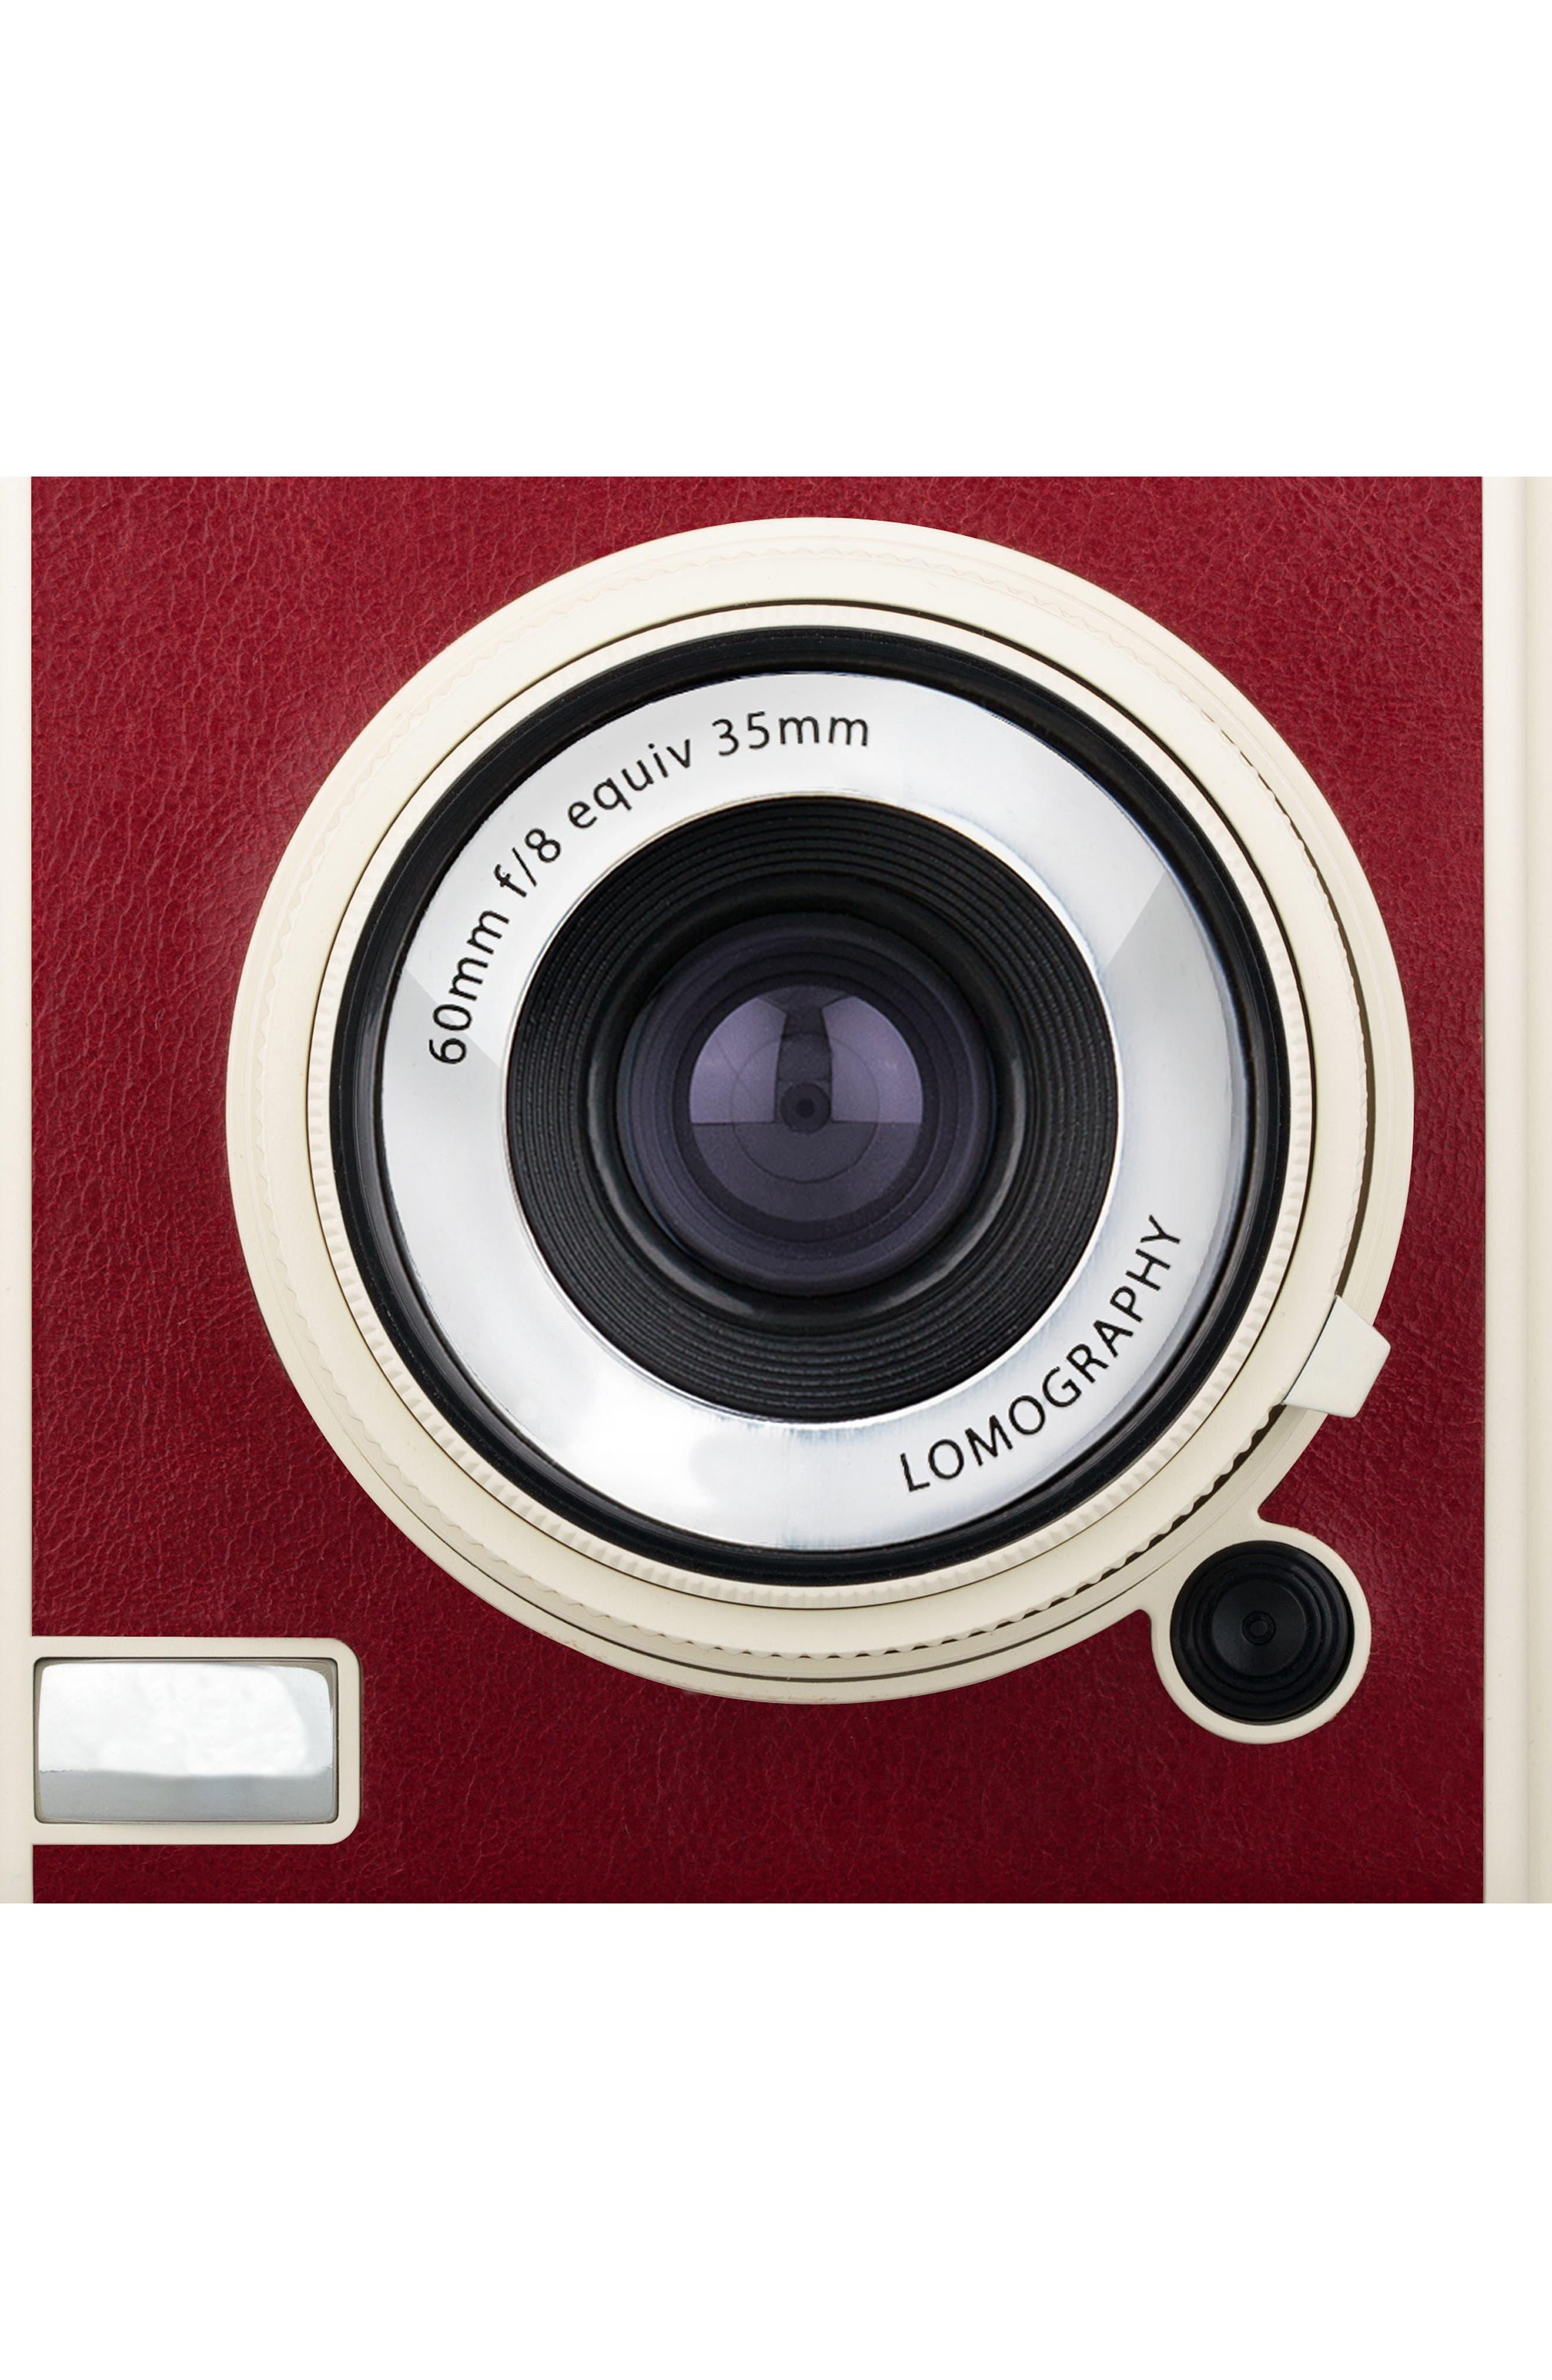 Lomo'Instant Automat South Beach Instant Camera,                             Alternate thumbnail 4, color,                             600